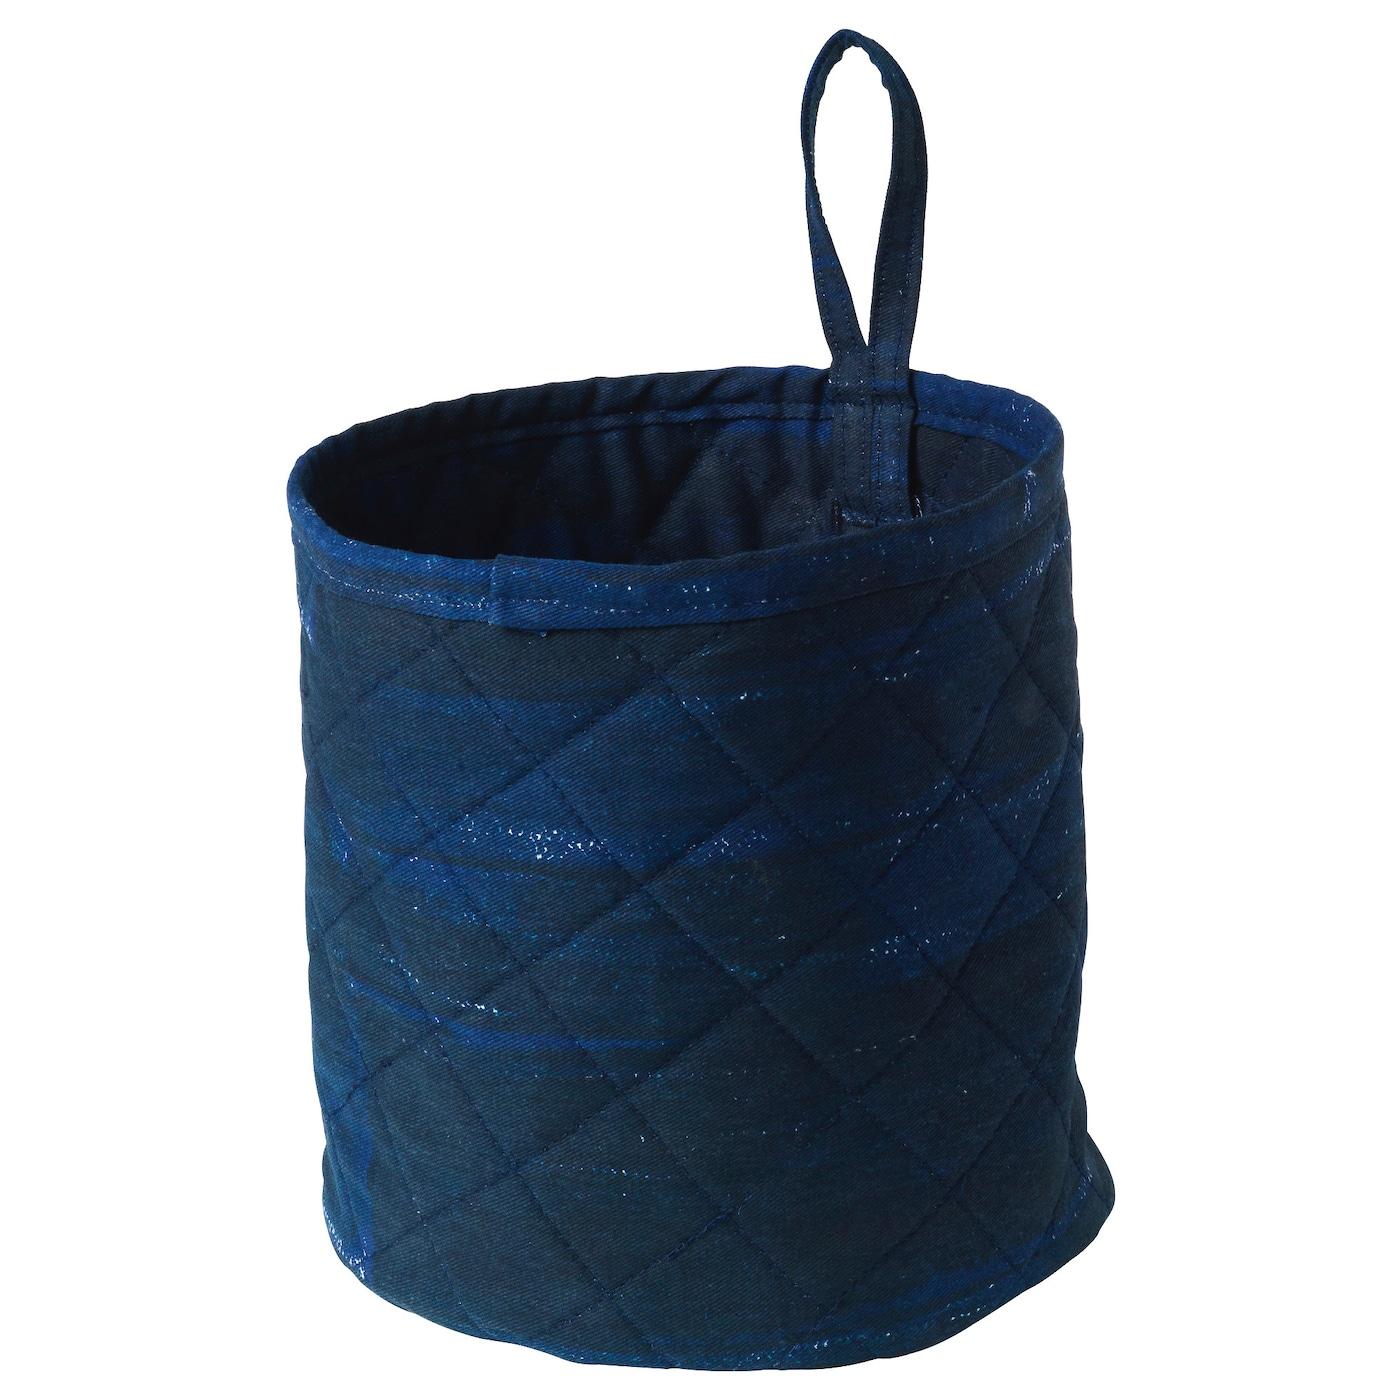 inneh llsrik panier fait main bleu 18 cm ikea. Black Bedroom Furniture Sets. Home Design Ideas